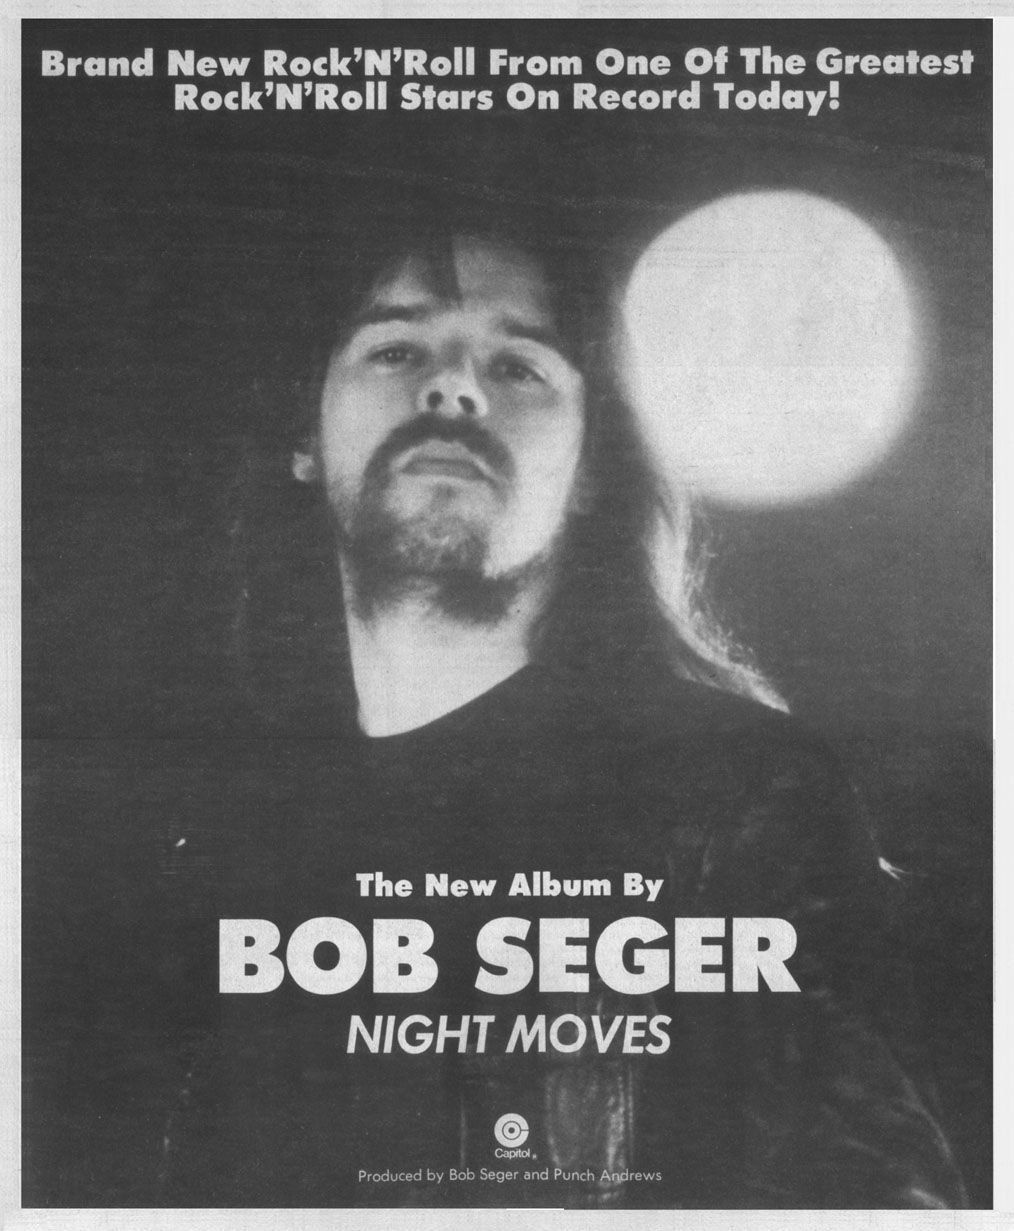 Stewart Seger Yahoo Search Results Bob Seger Cool Lyrics Night Moves